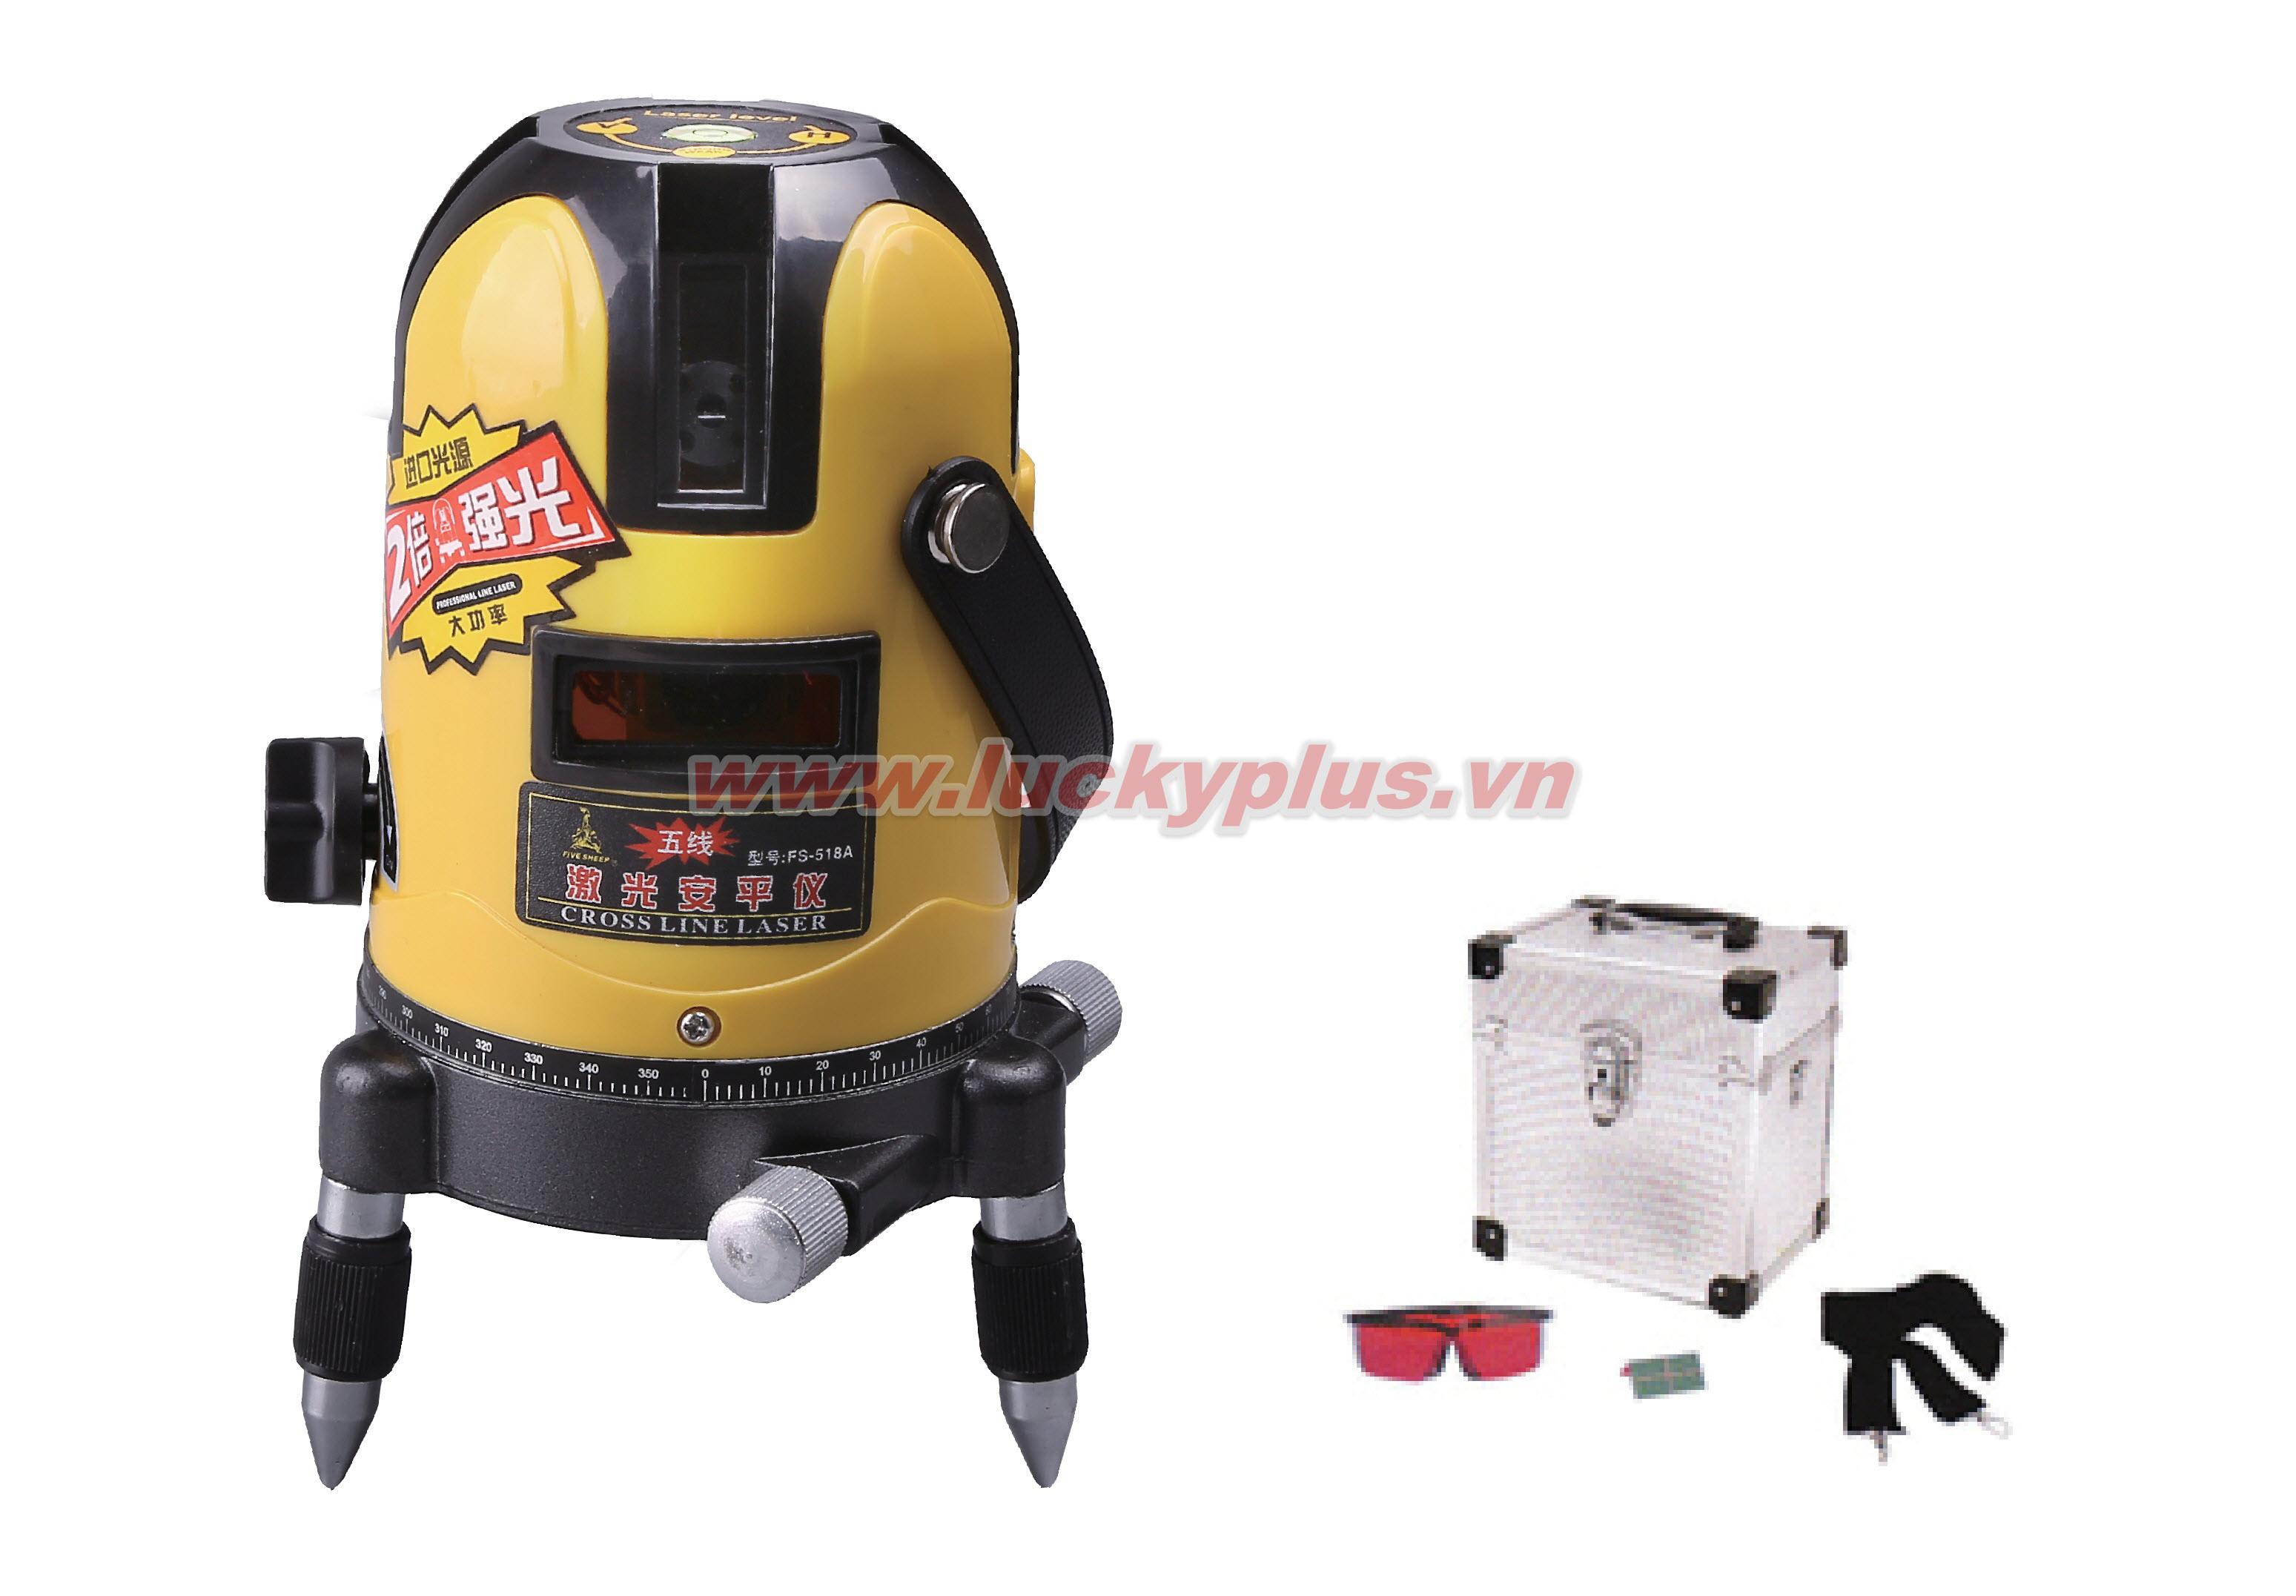 Đèn rọi laser FiveSheep FS-118A 2 tia, FS-318A 3 tia, FS-518A 5 tia